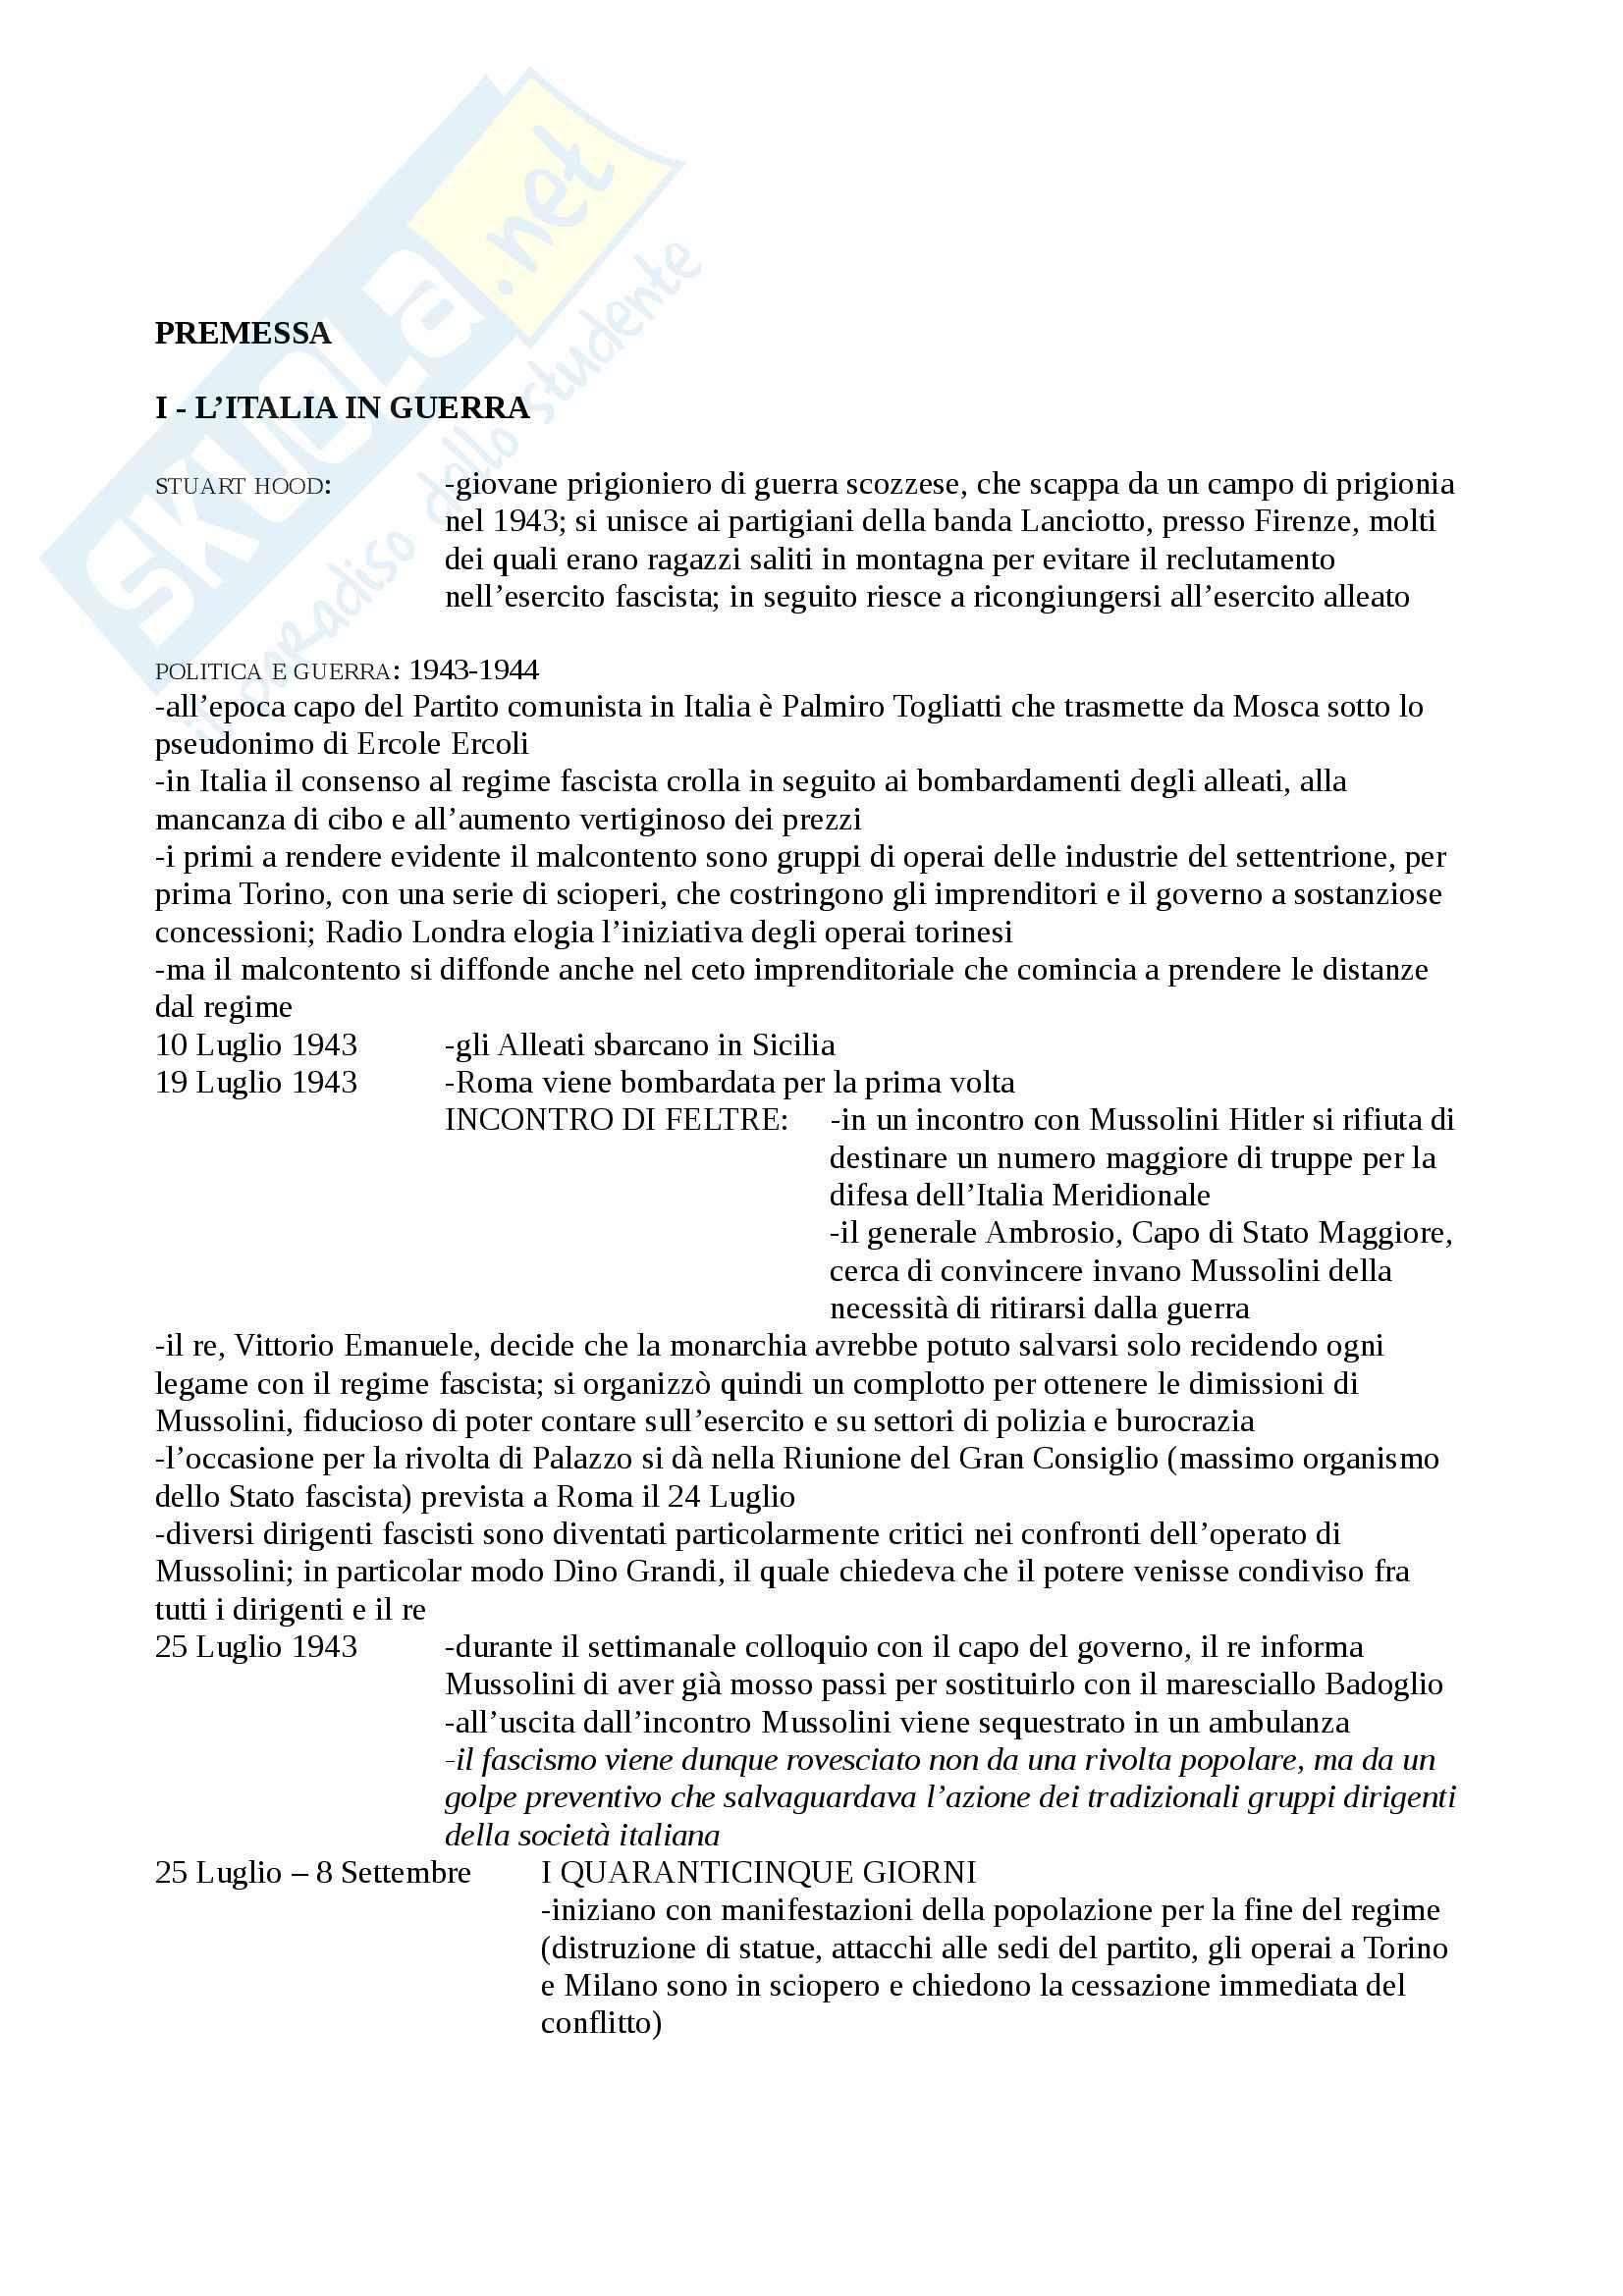 appunto P. Pezzino Storia Contemporanea